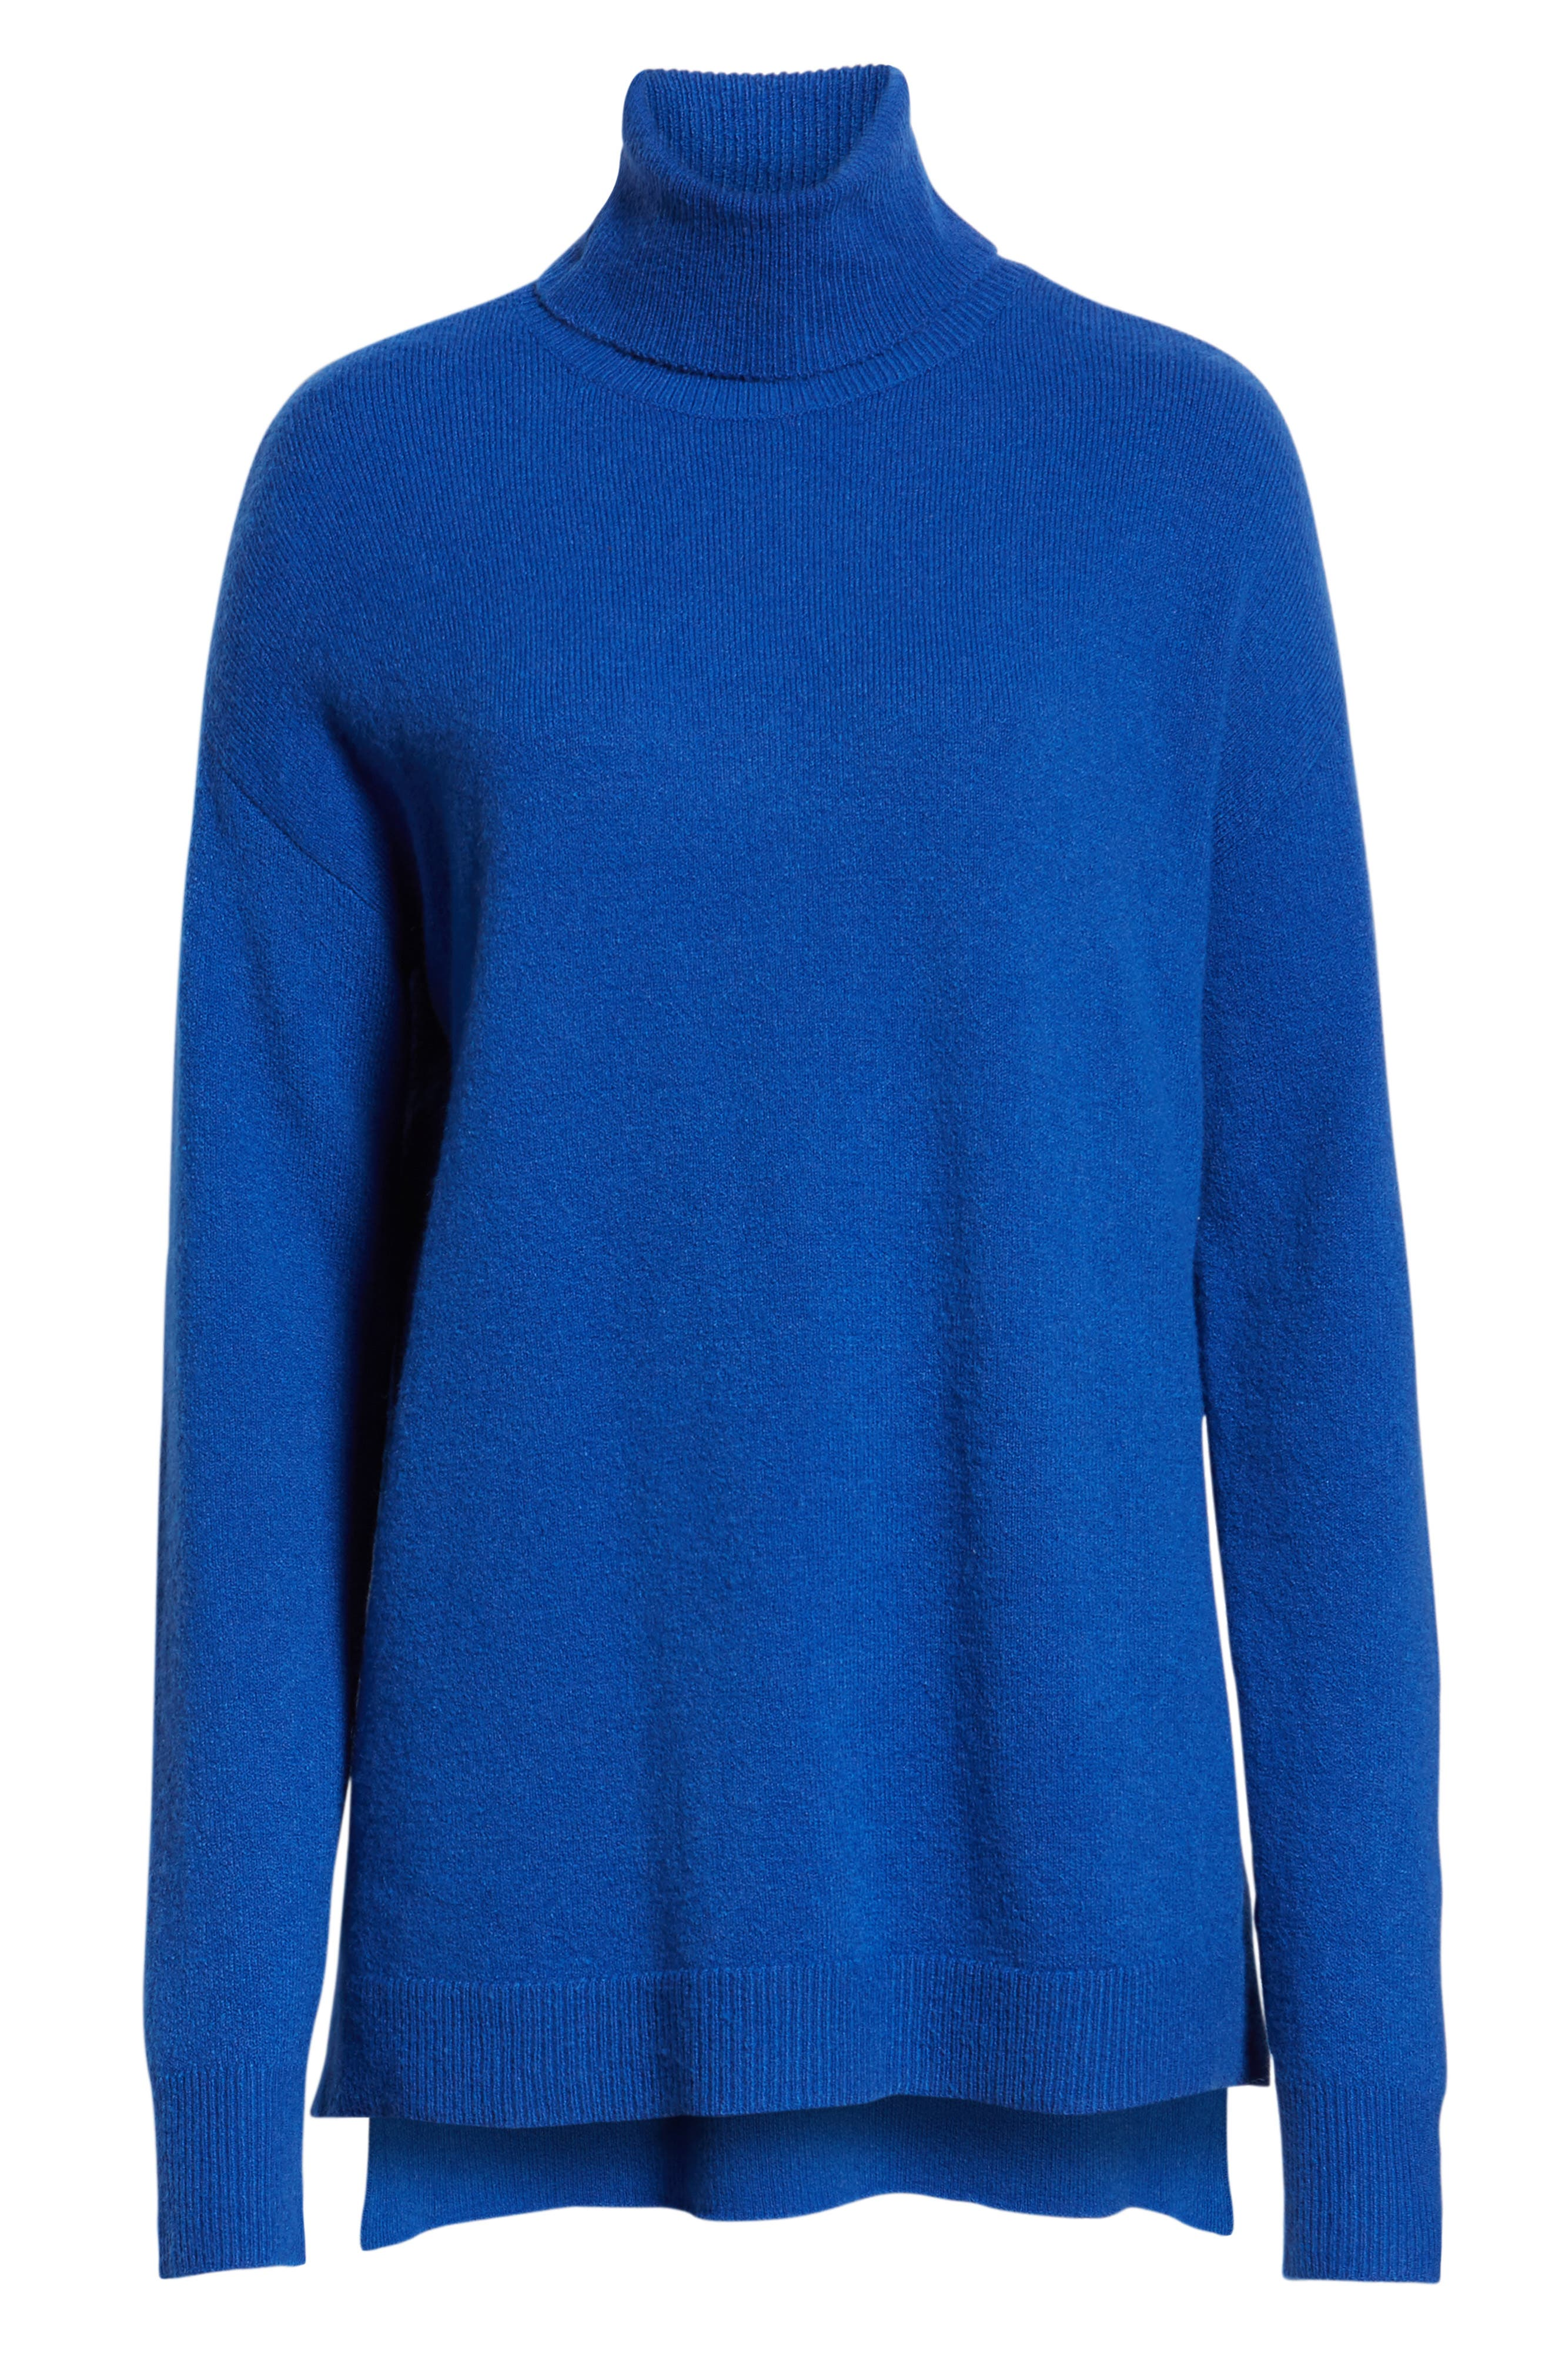 Turtleneck Wool Blend Tunic Sweater,                             Alternate thumbnail 6, color,                             BLUE MAZARINE